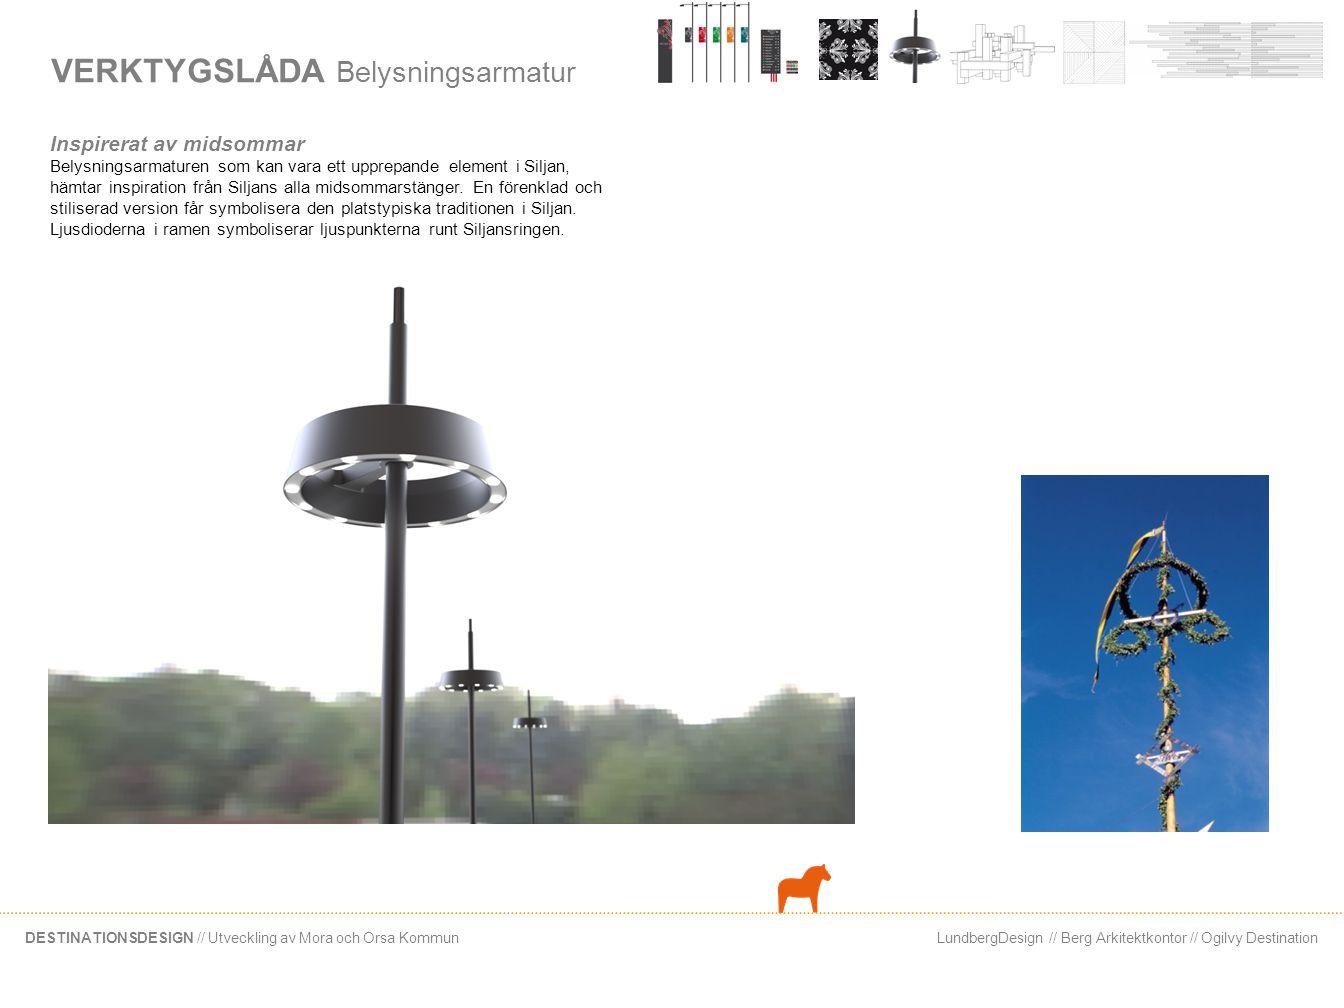 LundbergDesign // Berg Arkitektkontor // Ogilvy DestinationDESTINATIONSDESIGN // Utveckling av Mora och Orsa Kommun VERKTYGSLÅDA Belysningsarmatur Ins